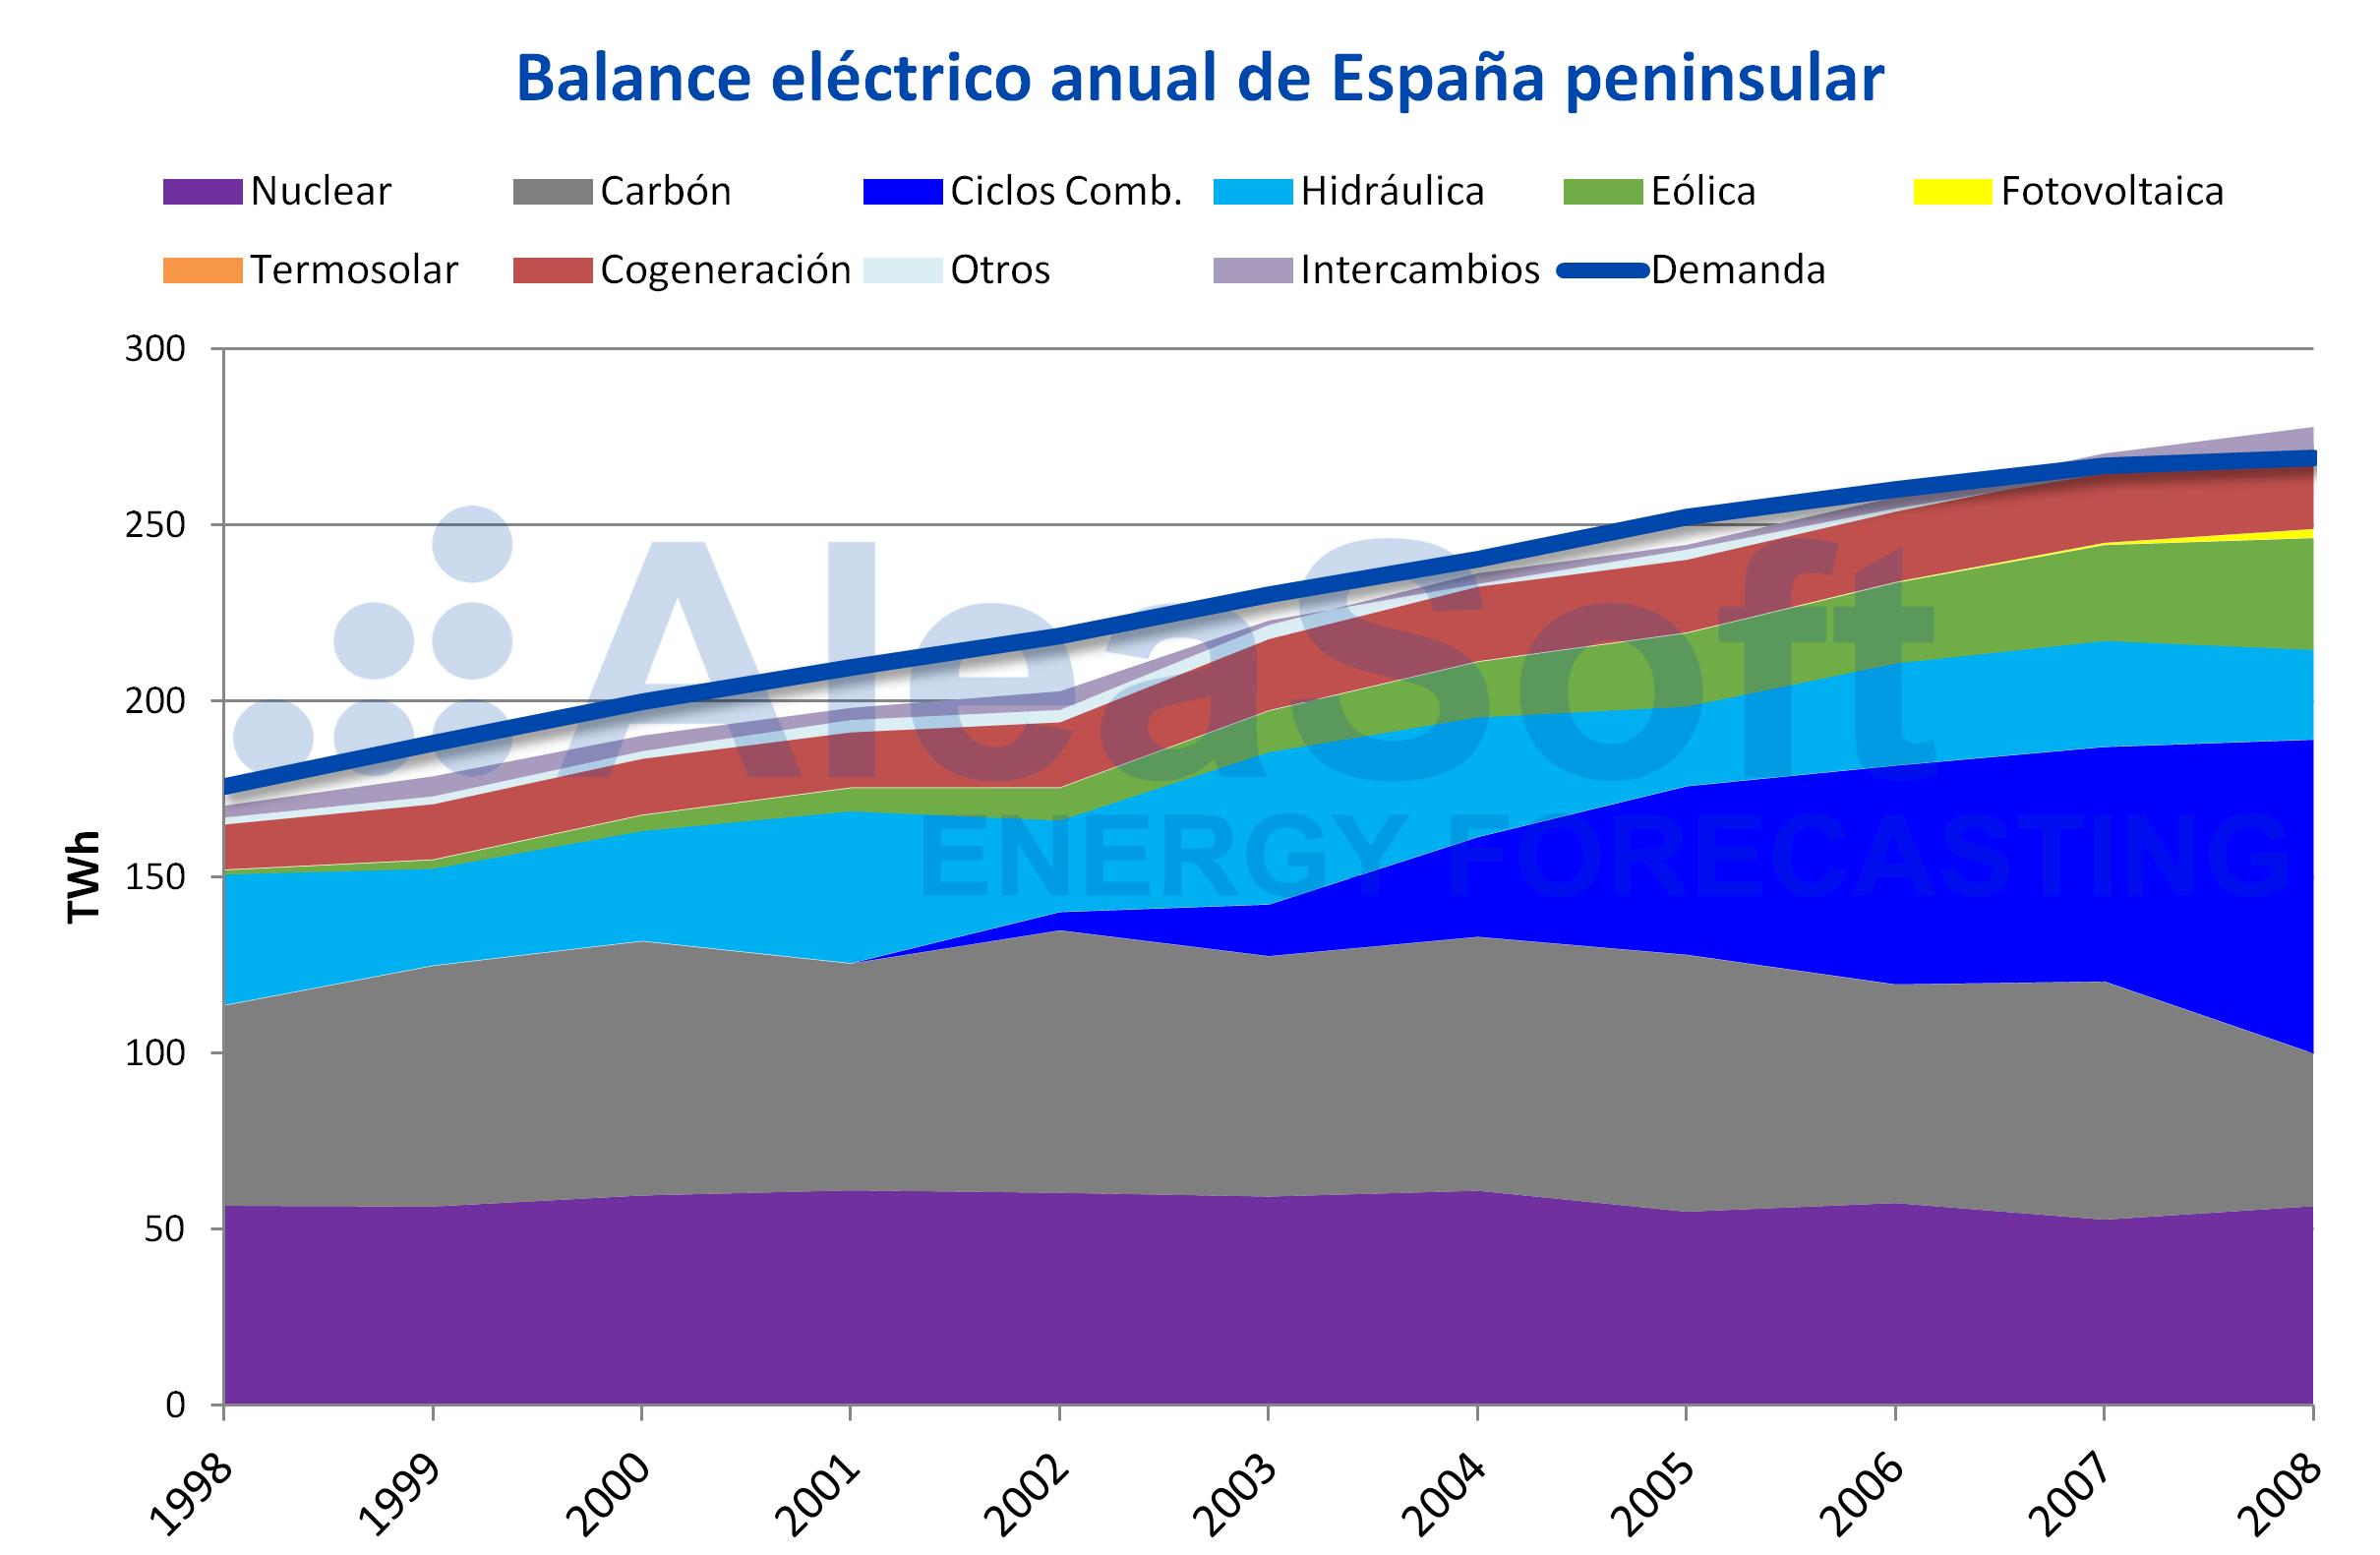 AleaSoft - Balance eléctrico España peninsular